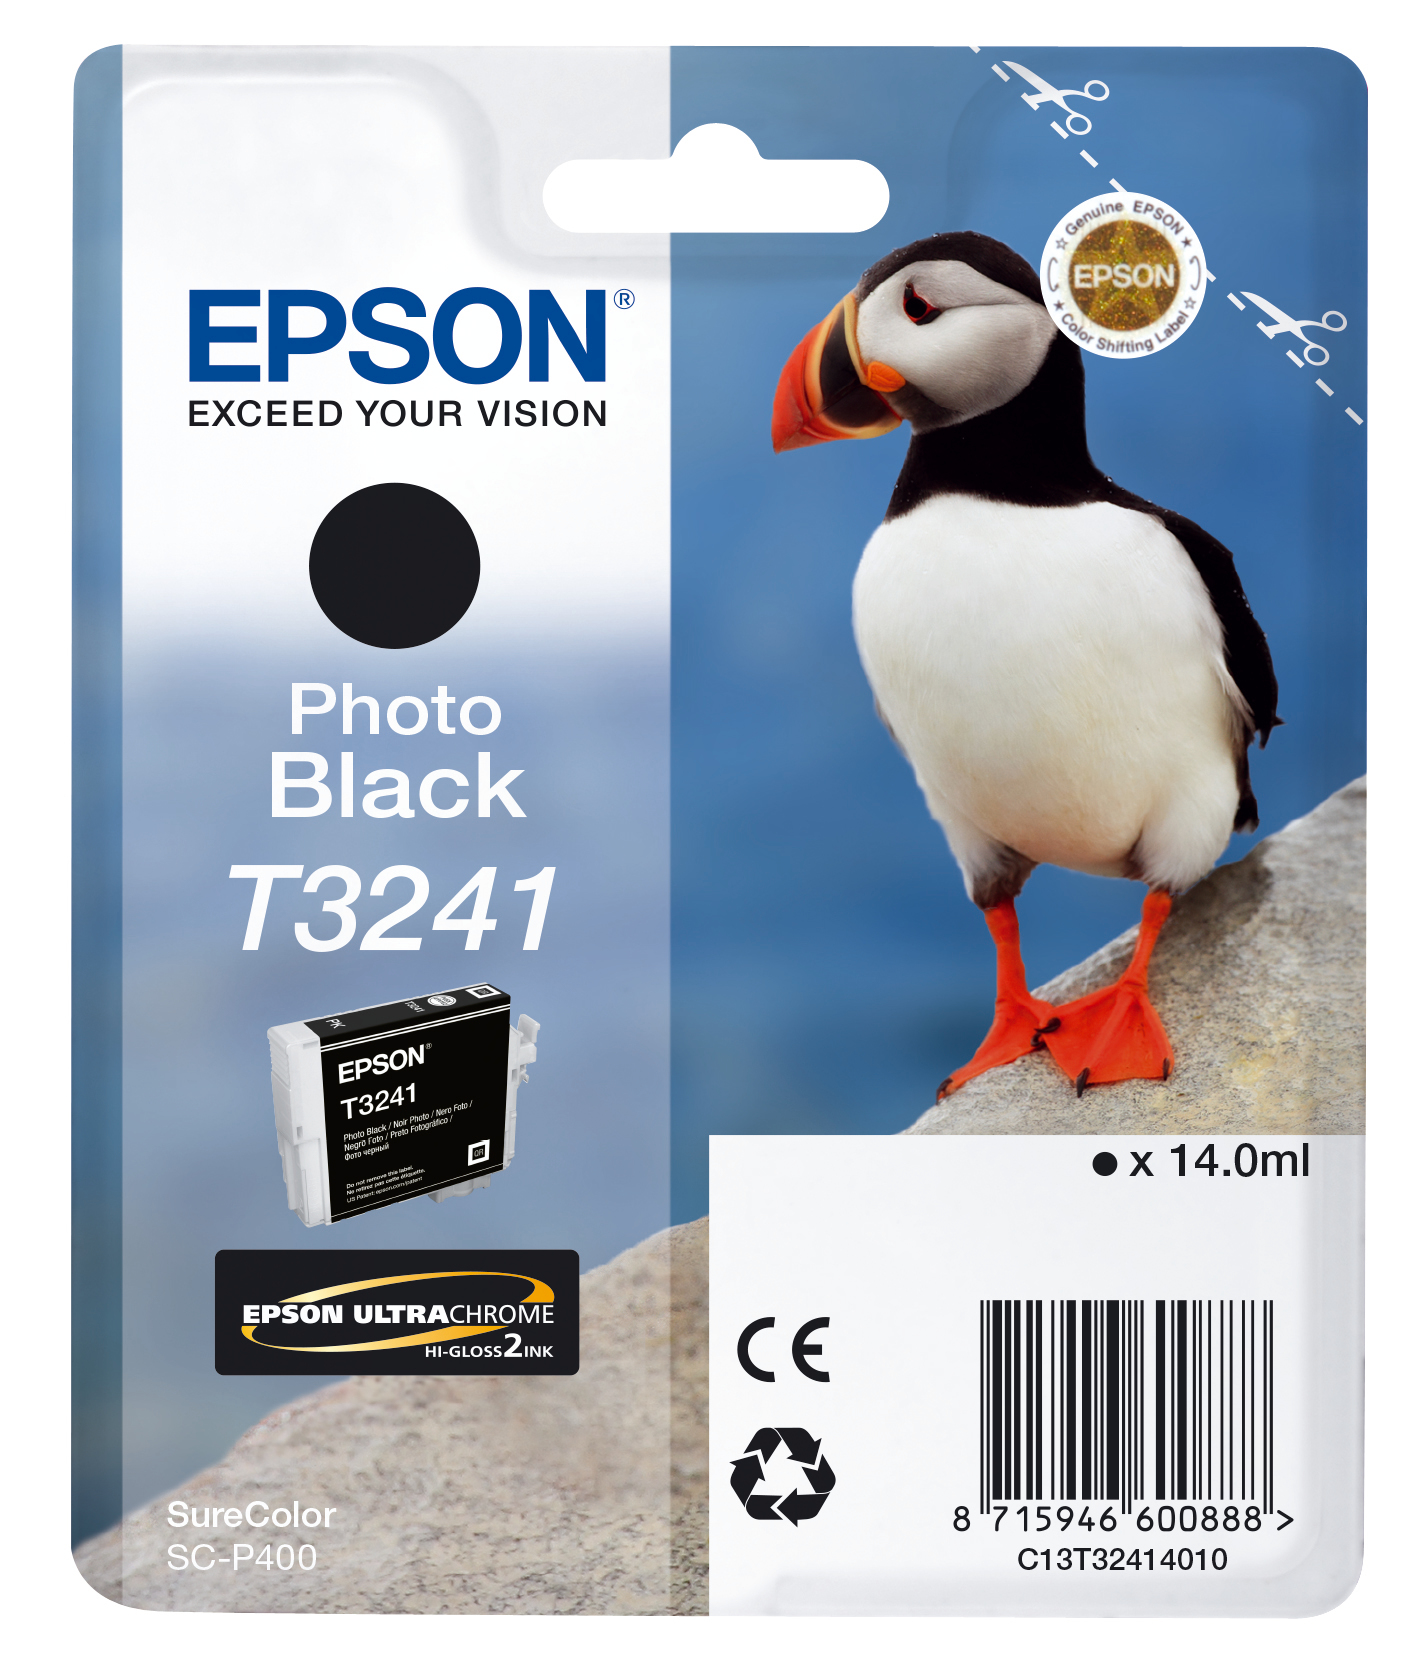 Epson T3241 Photo Black